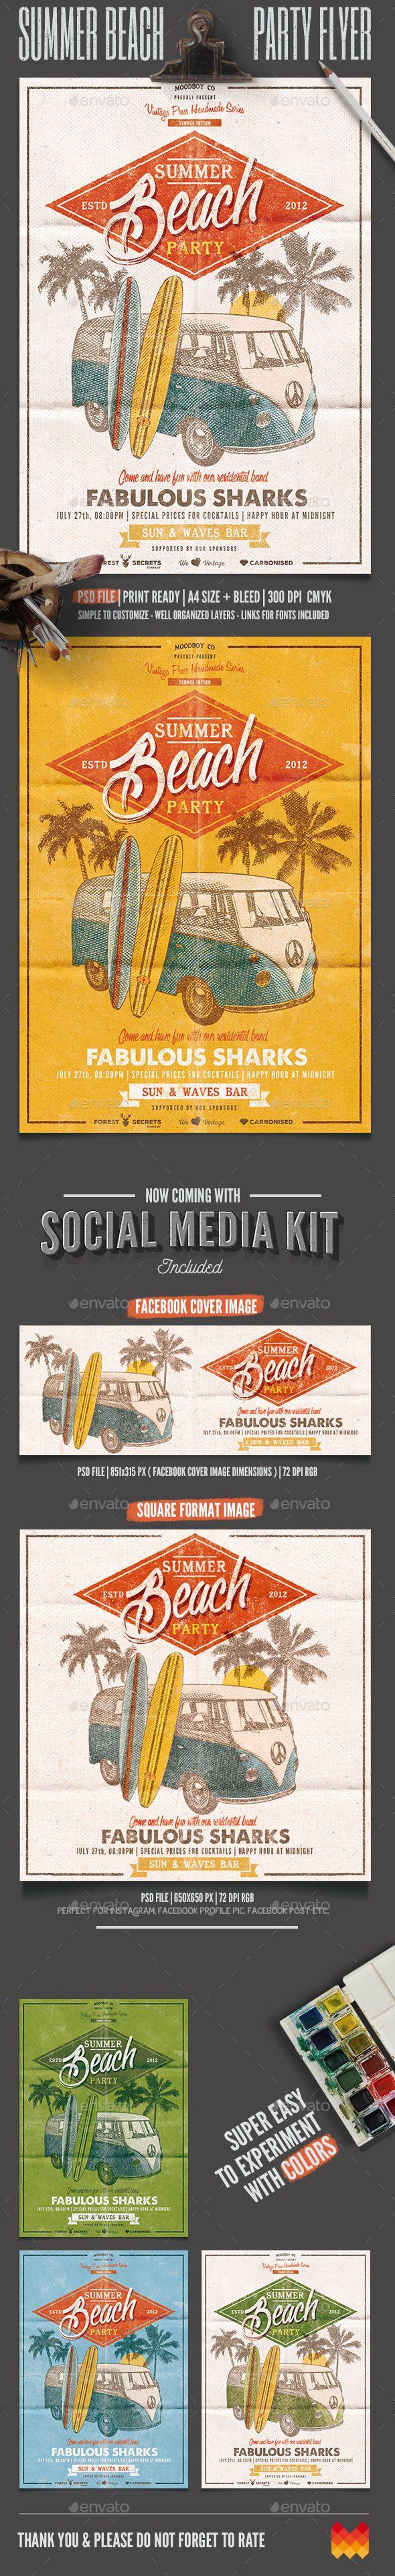 Summer Beach Party Flyer/Poster Template #design Download: http://graphicriver.net/item/summer-beach-party-flyerposter/12057652?ref=ksioks